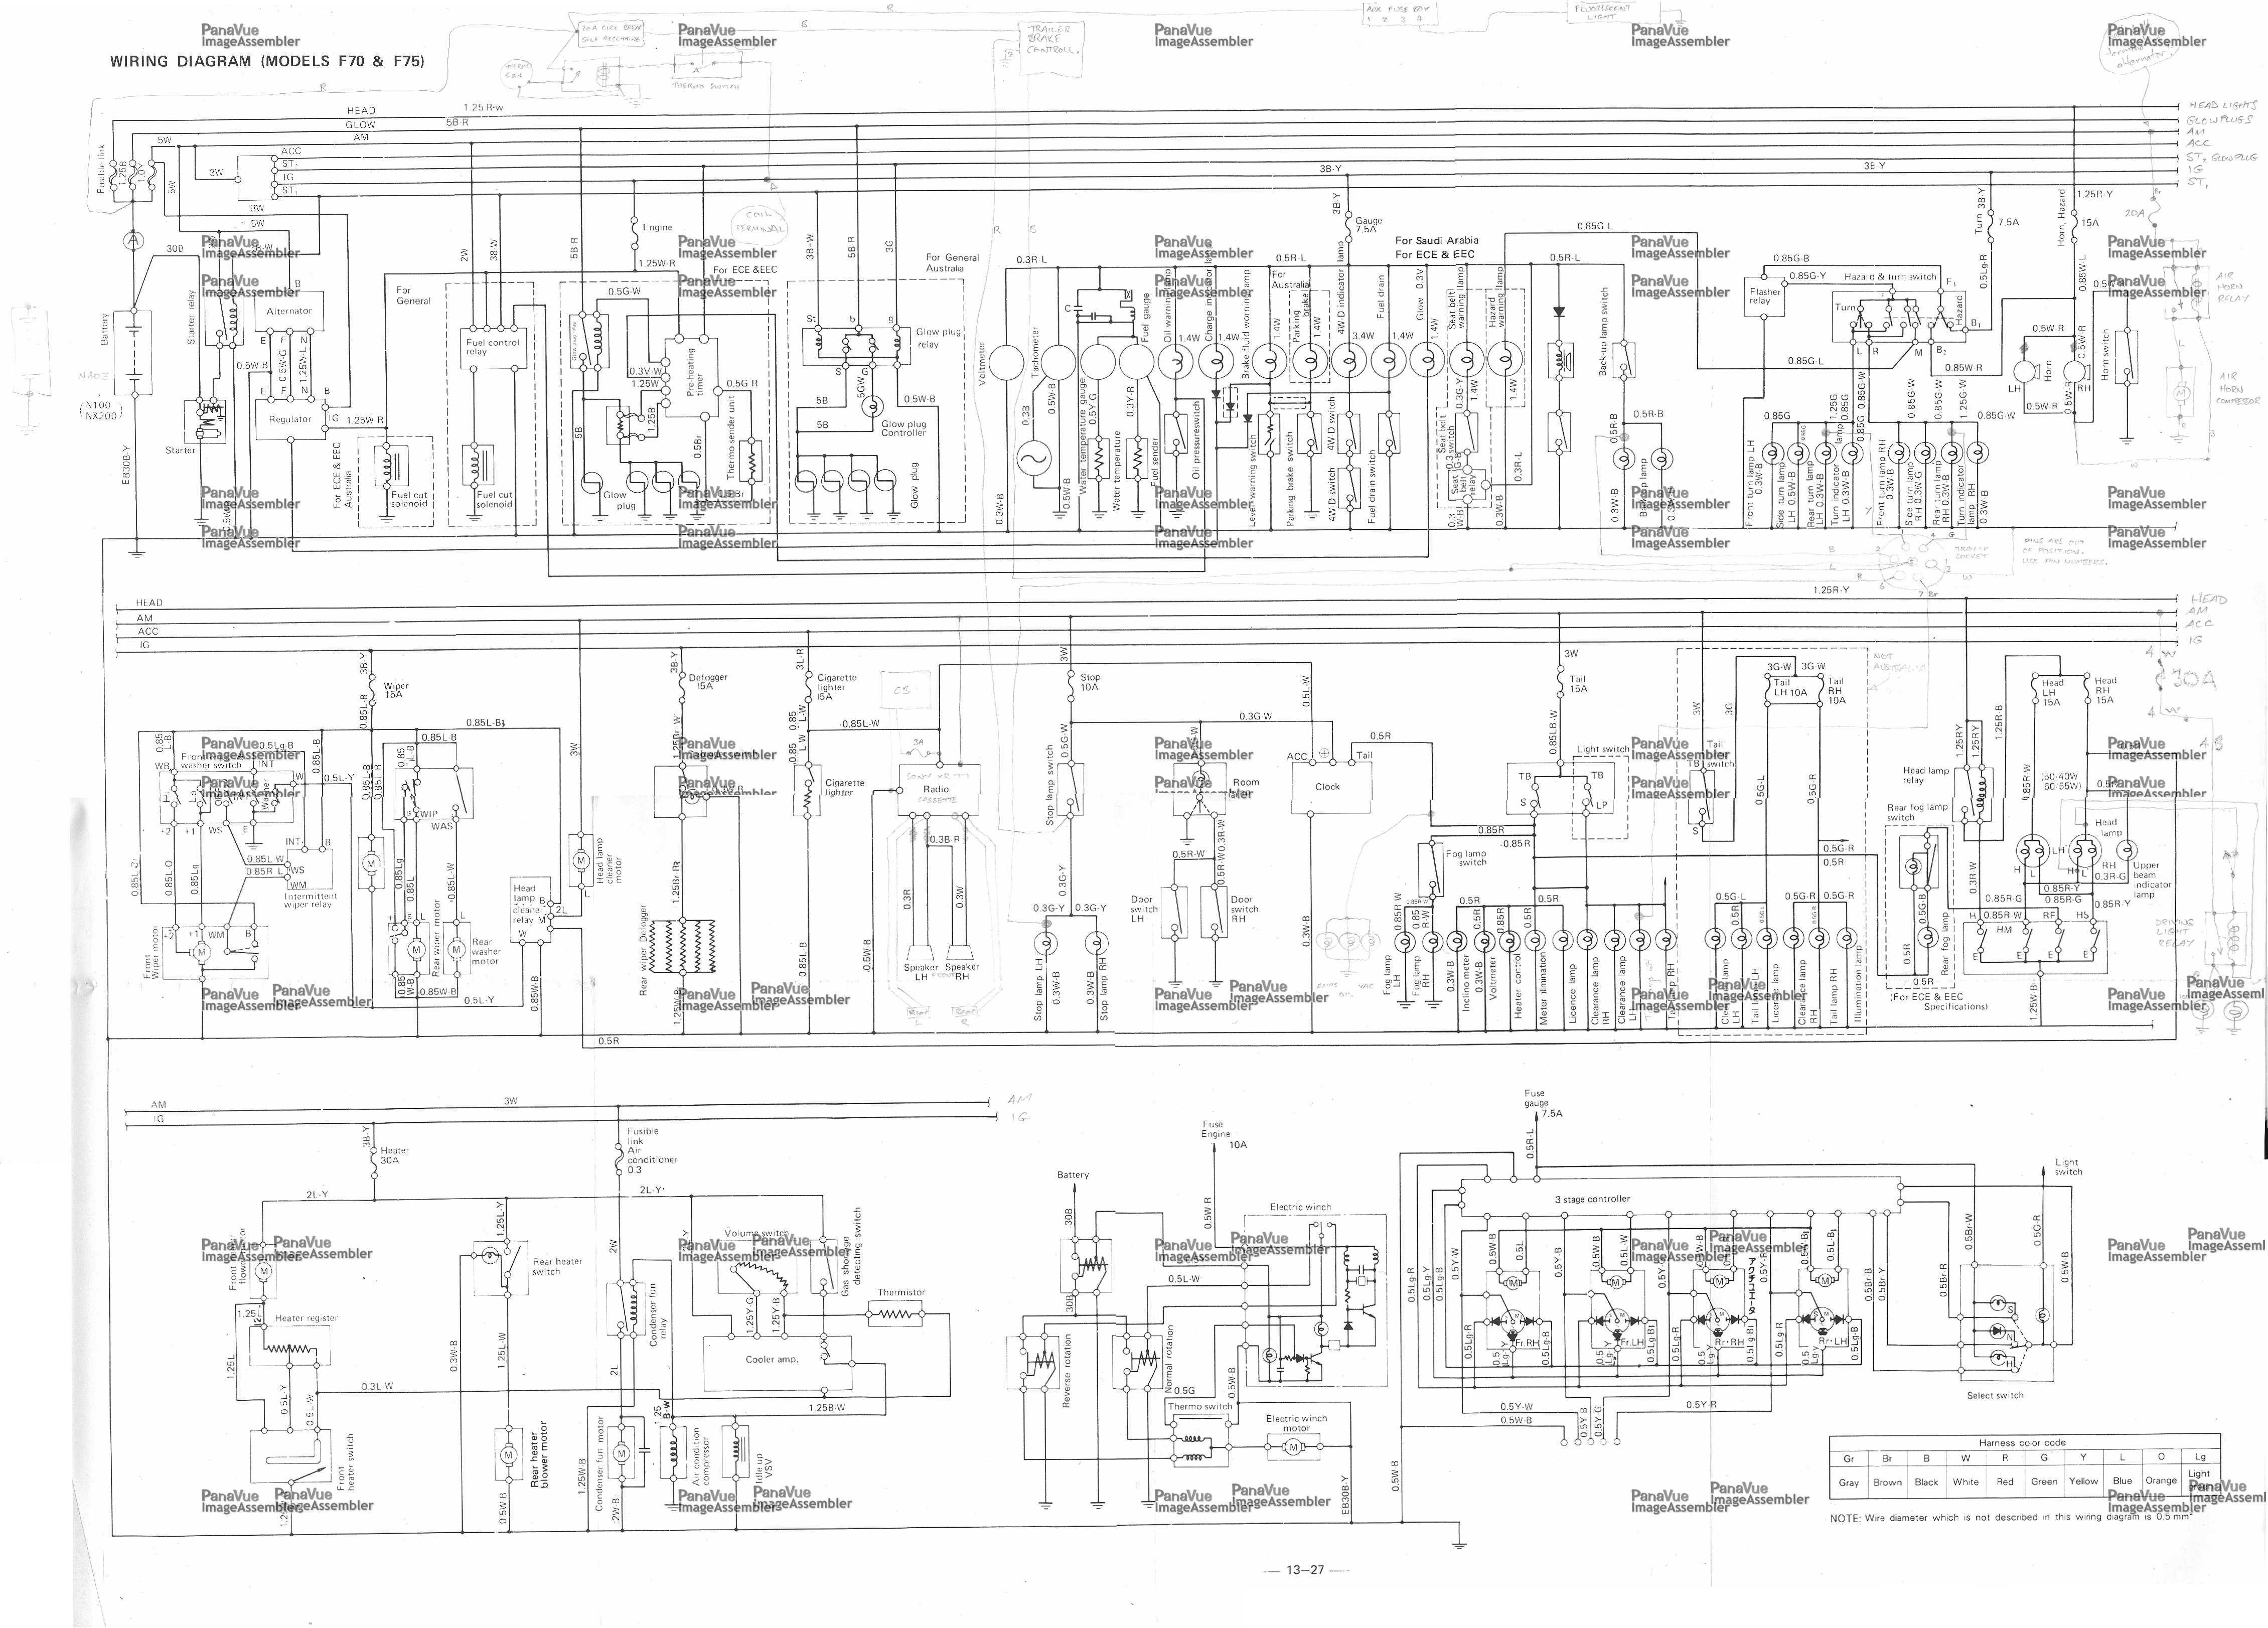 Daihatsu+Wiring+Diagram+F70 F75?t\\\=1497195765 daihatsu ej ve ecu wiring diagram volkswagen wiring diagram kenwood dpx791bh wiring diagram at soozxer.org